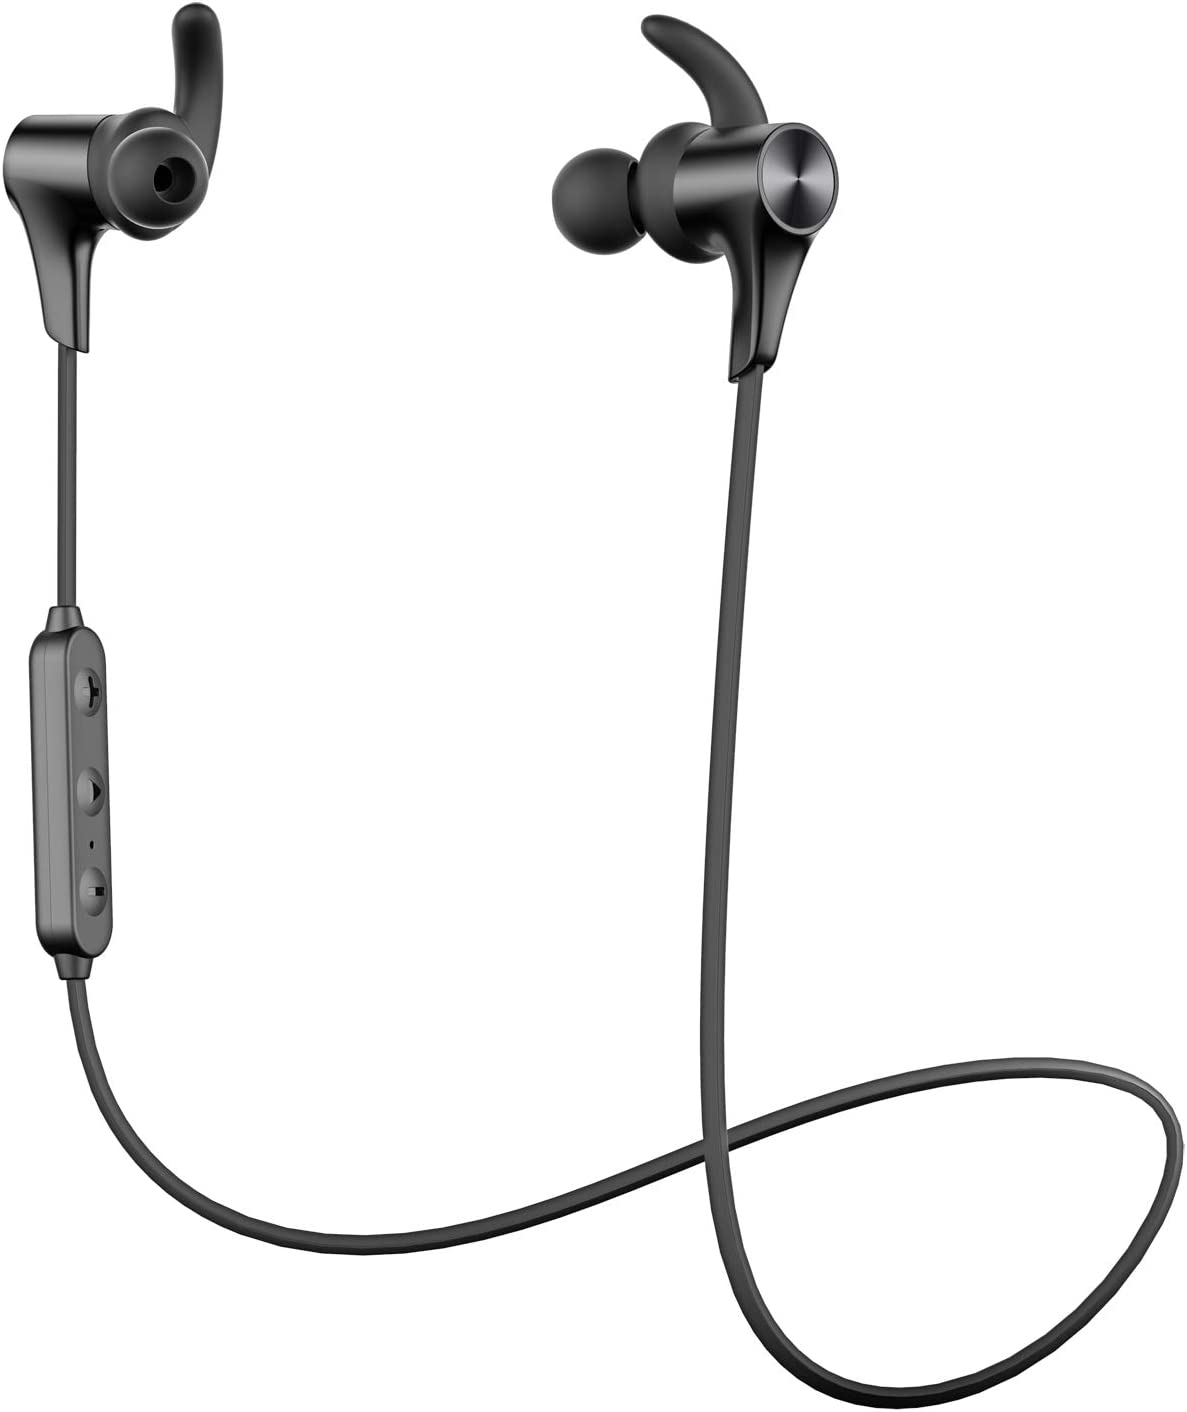 SoundPEATS 【Nuevo Versión Q12 HD】 Auriculares Bluetooth 5.0 Inalámbrico Magnéticos, Cascos Deportivos IPX6 Impermeable con Mic In Ear Incorporado Estéreo, Duración 9 Horas para iOS Android PC (Negro)